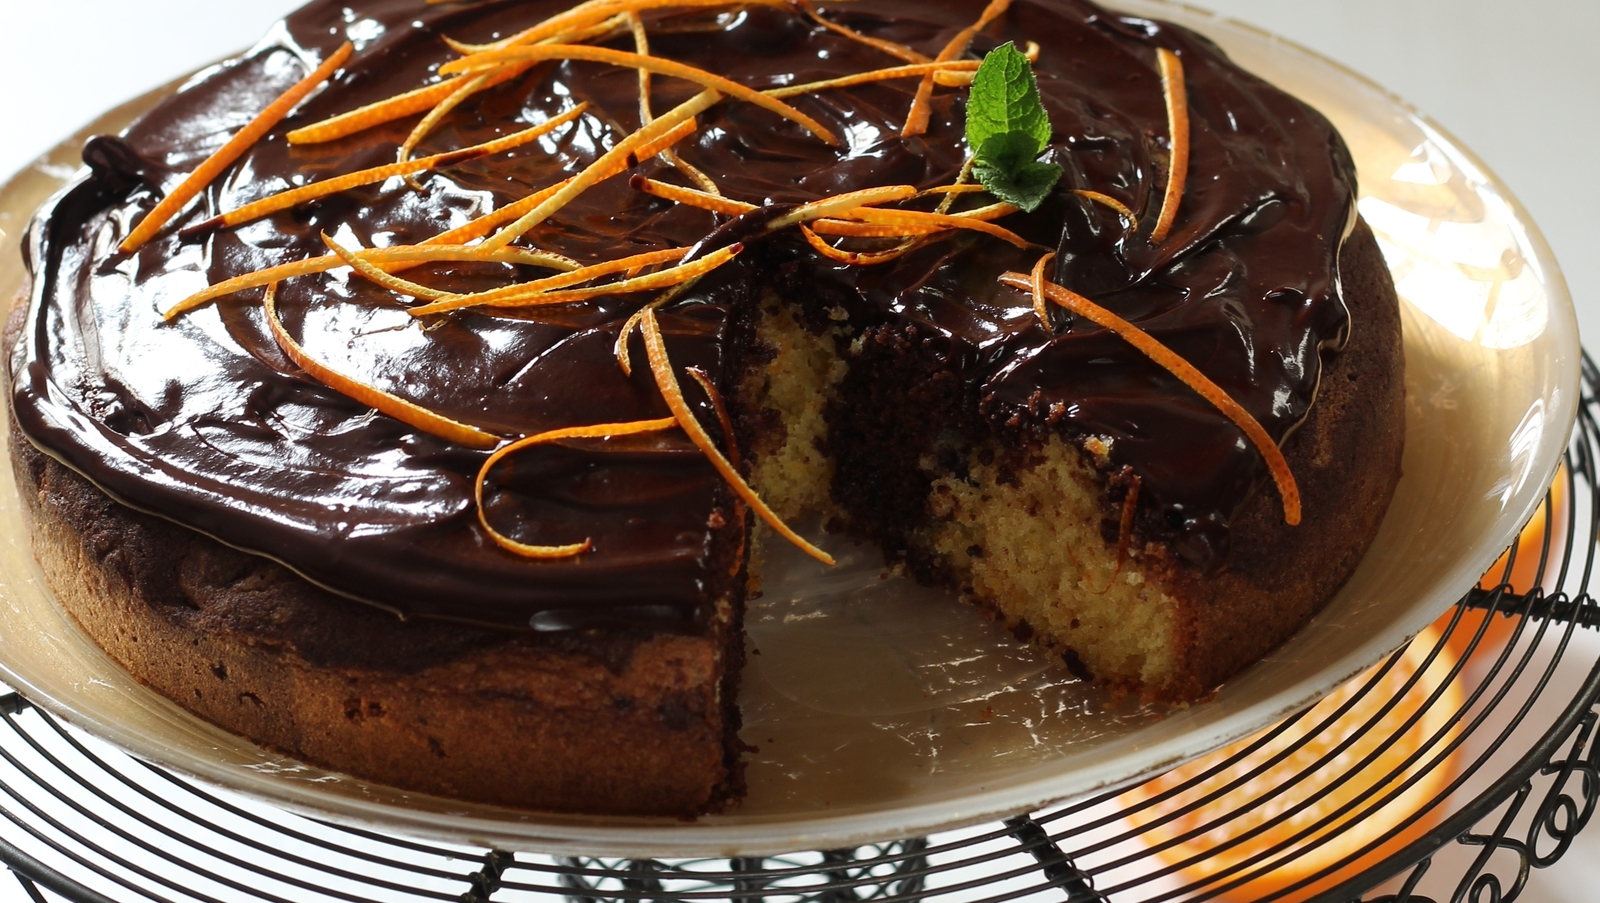 Shane Smiths Chocolate Orange Marble Cake Today